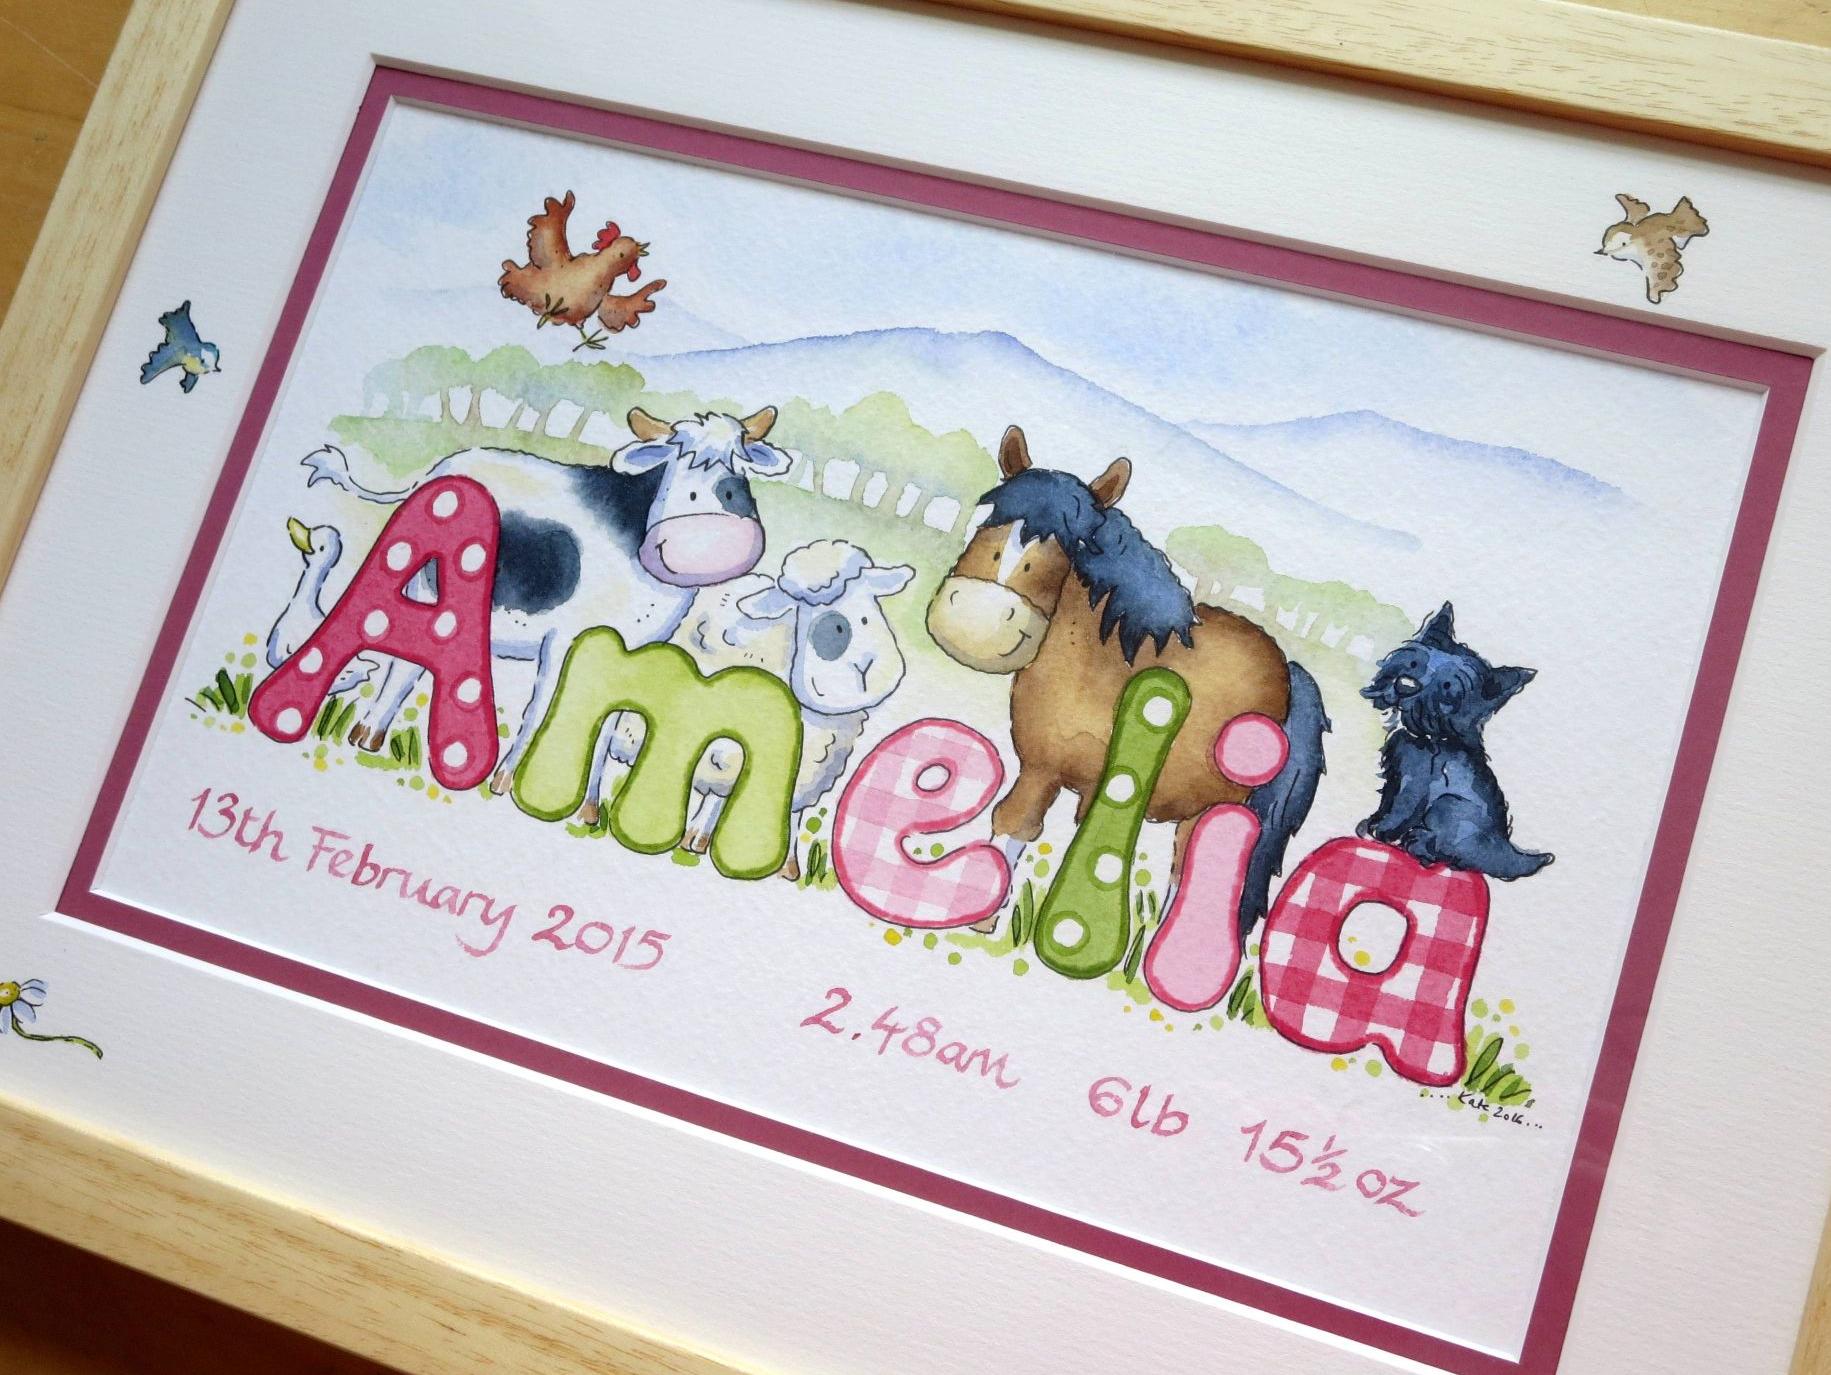 Amelia framed